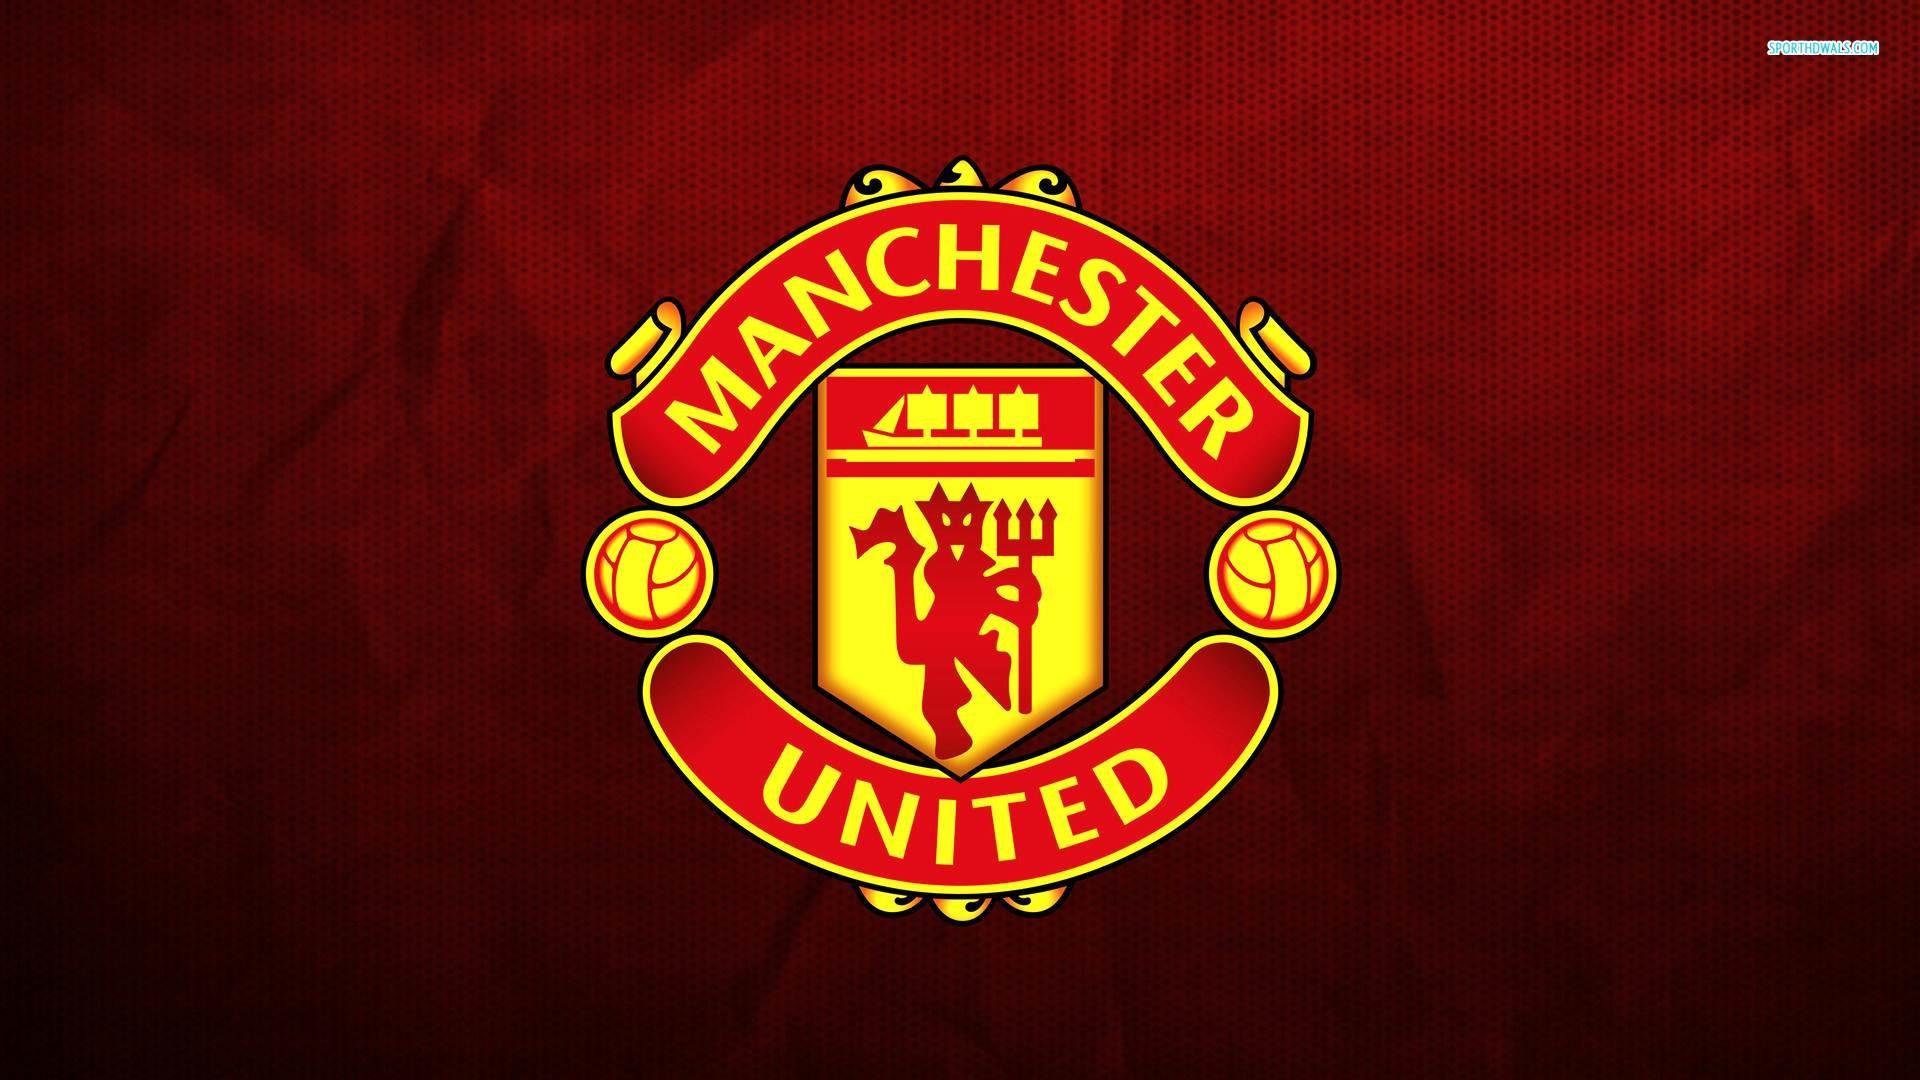 Manchester United Wallpaper Hd Wallpapertag